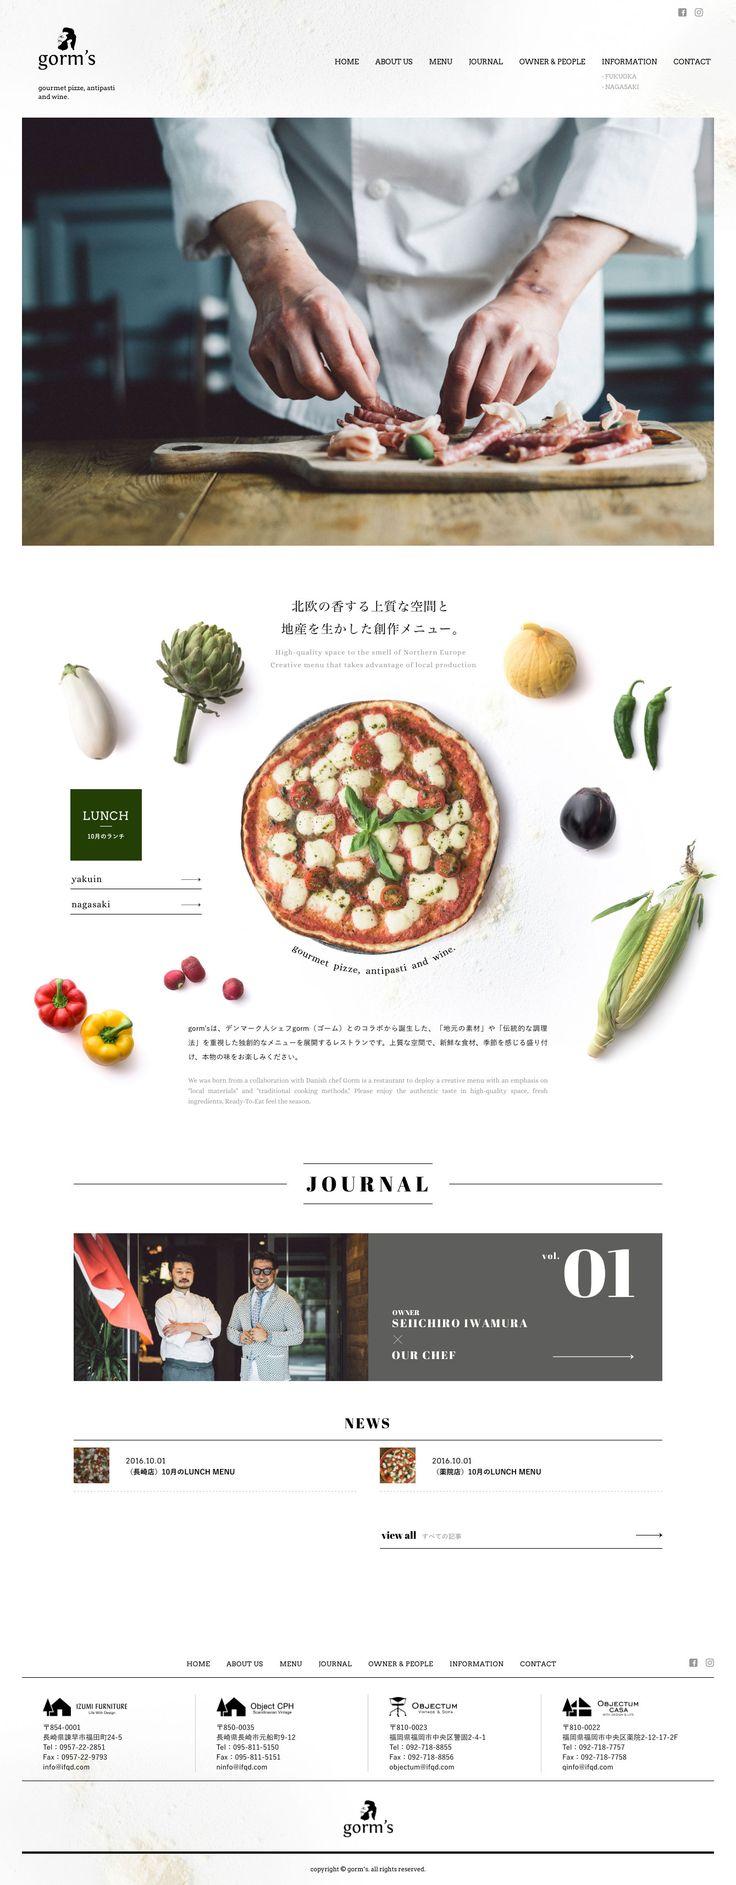 gorm's|oniguili